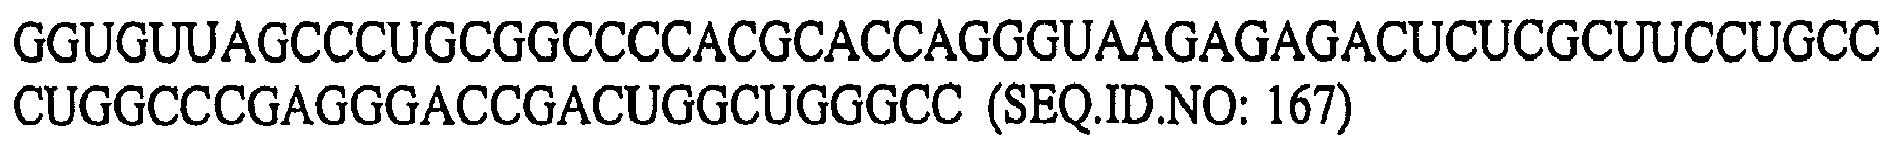 Figure imgb0073